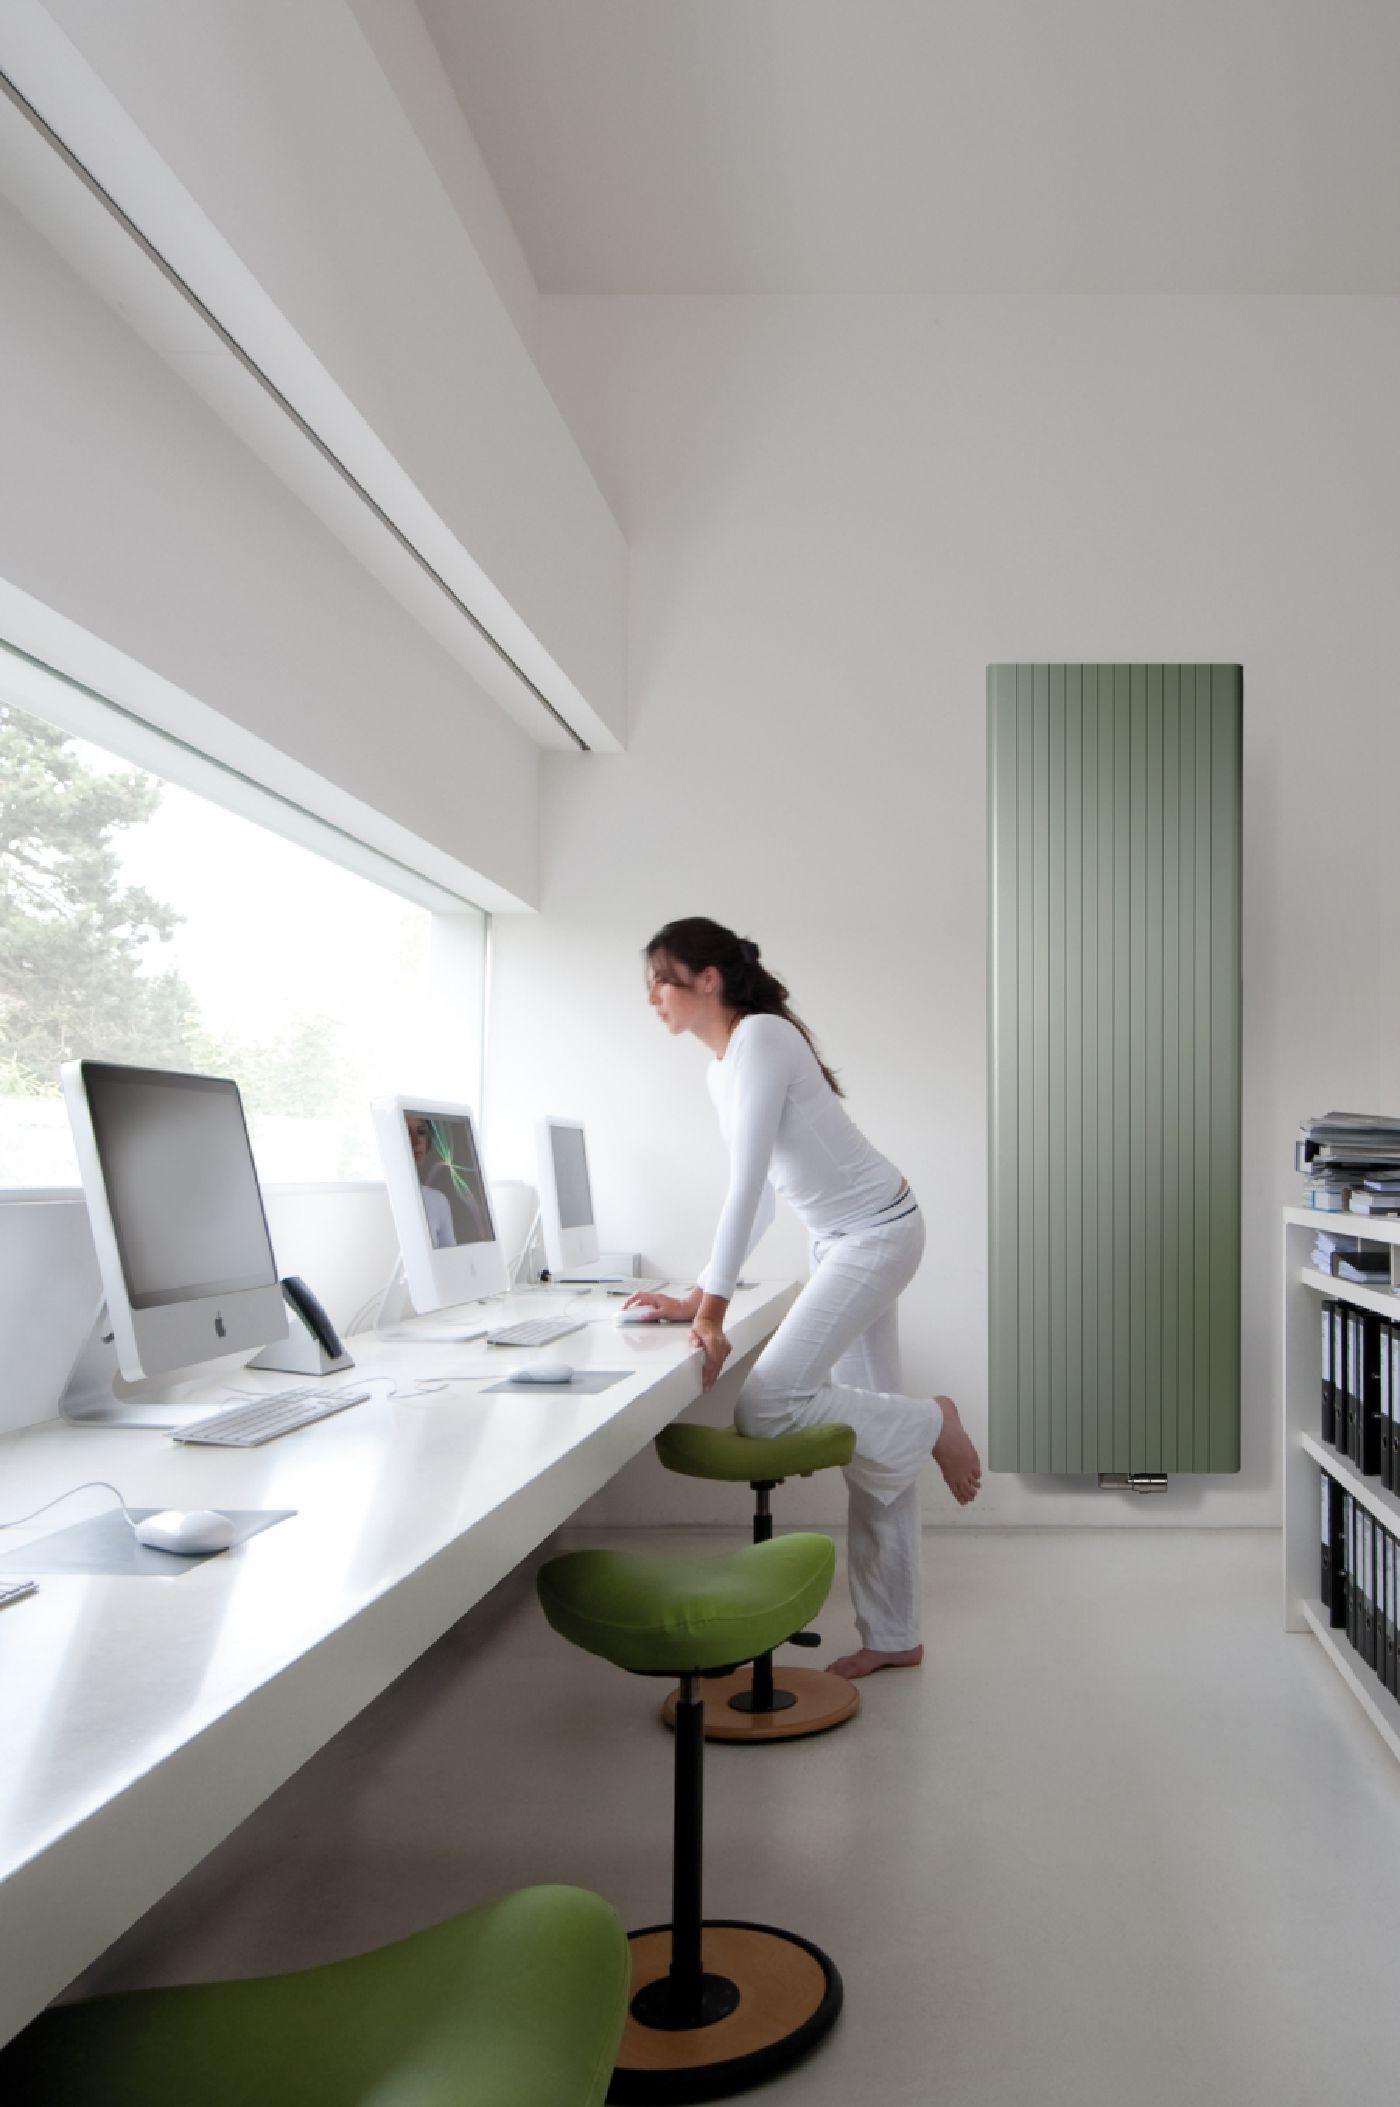 Full Size of Vasco Heizkörper Markenwelt Wohnzimmer Badezimmer Für Bad Elektroheizkörper Wohnzimmer Vasco Heizkörper